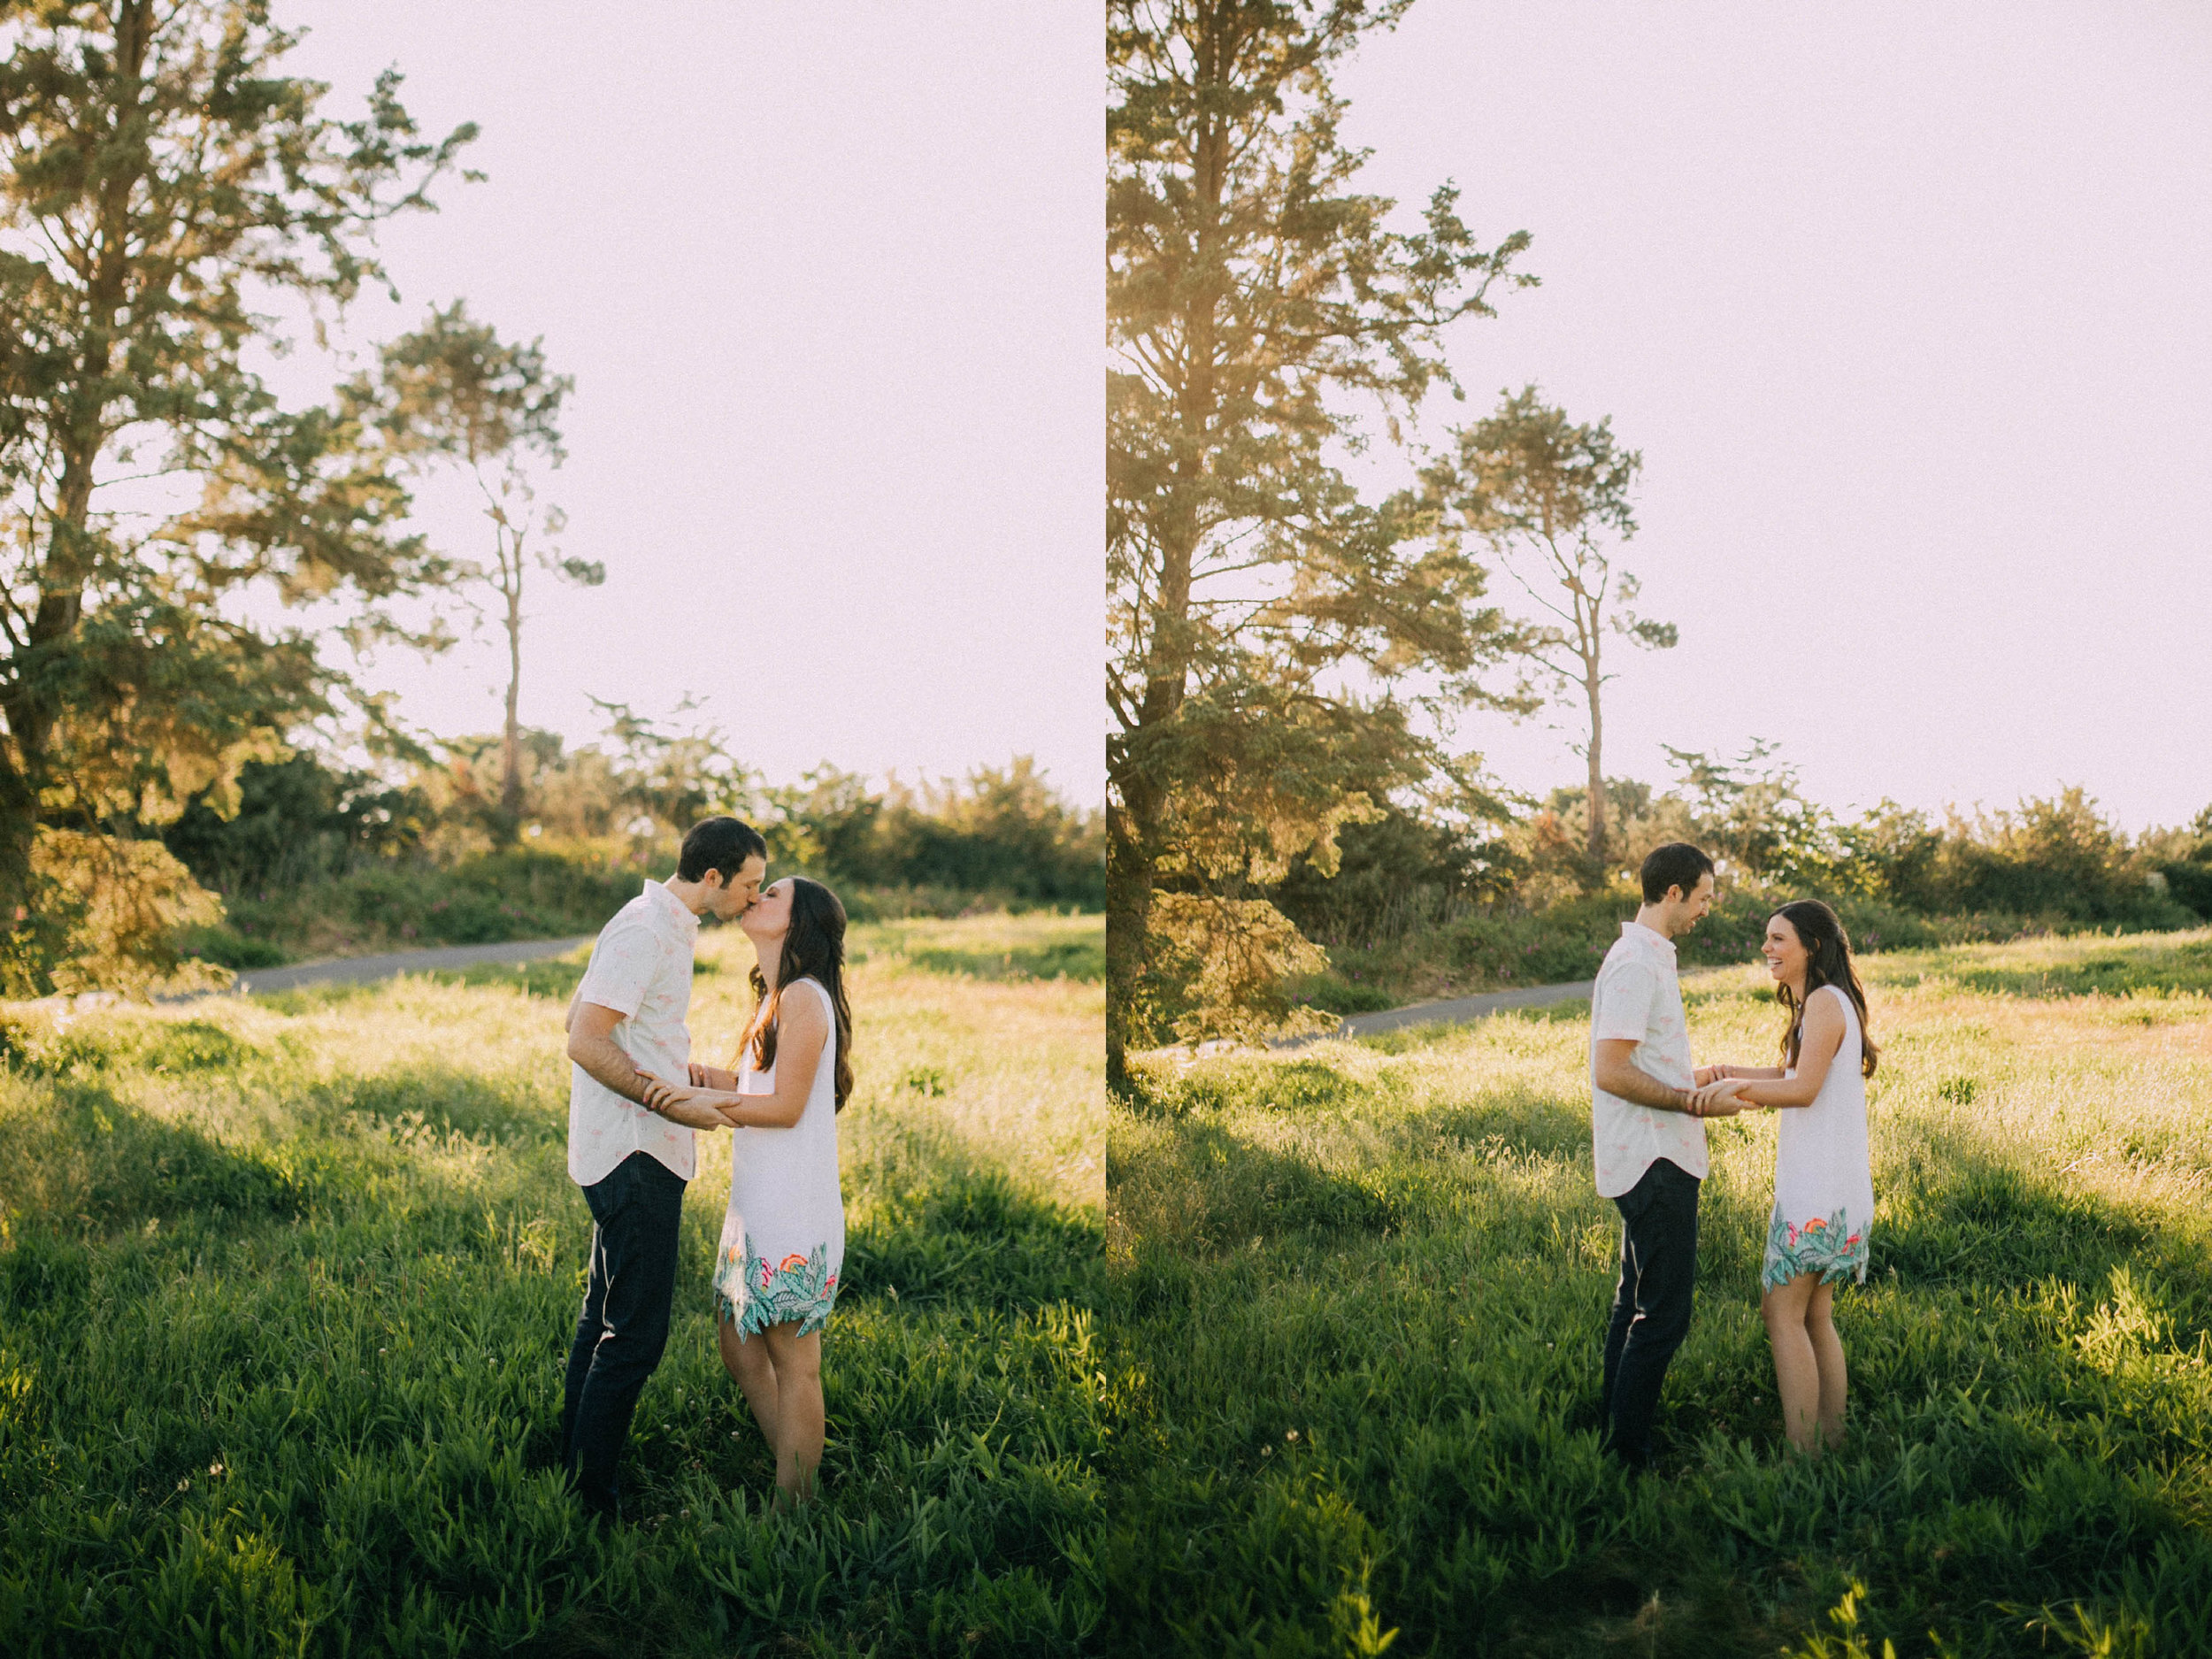 discovery park engagement photography seattle washington wedding photographer romantic-242.jpg